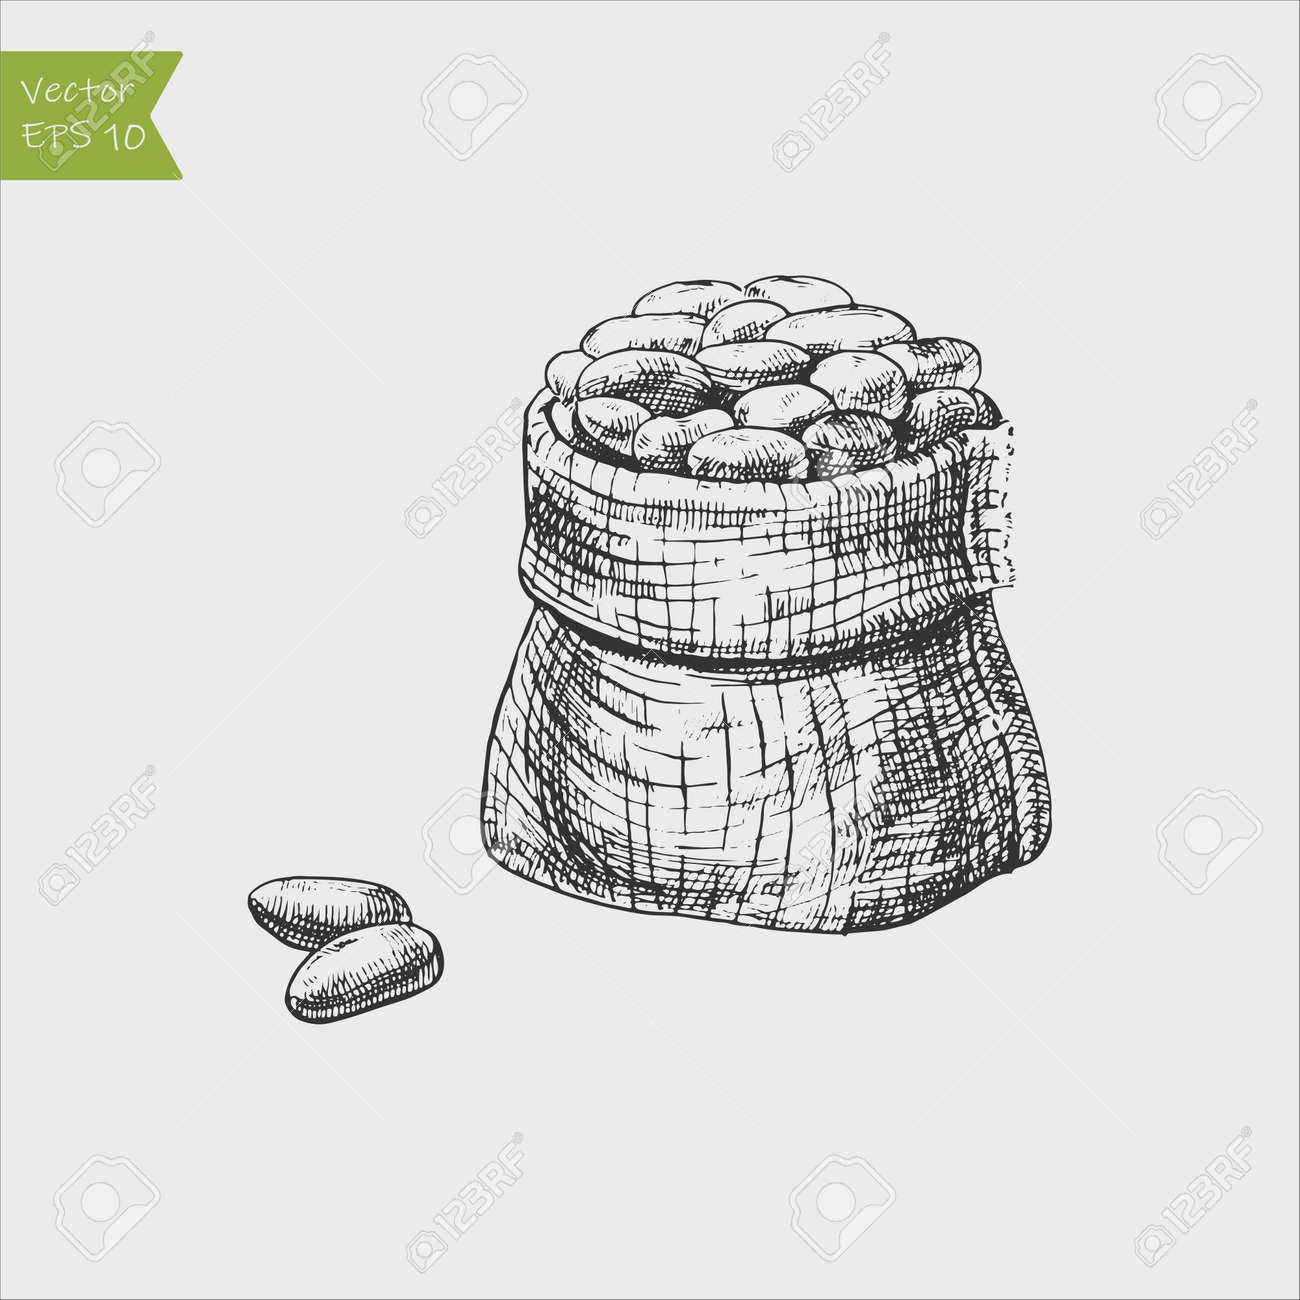 A bag of cocoa beans, or coffee. Broken fruit. - 163875421